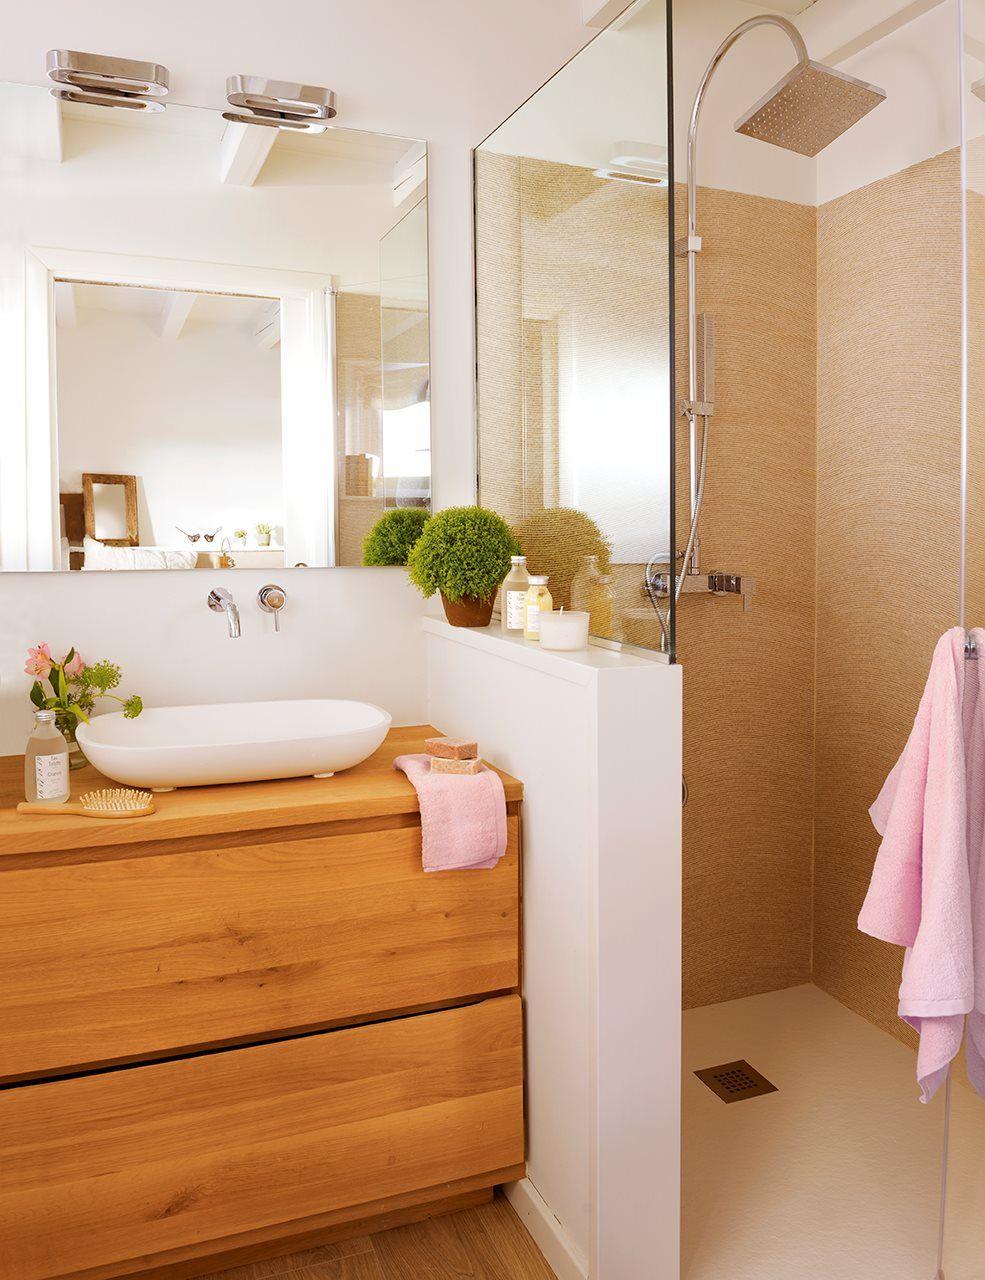 Cambio de imagen para un apartamento de monta a elmueble for Decoracion duchas